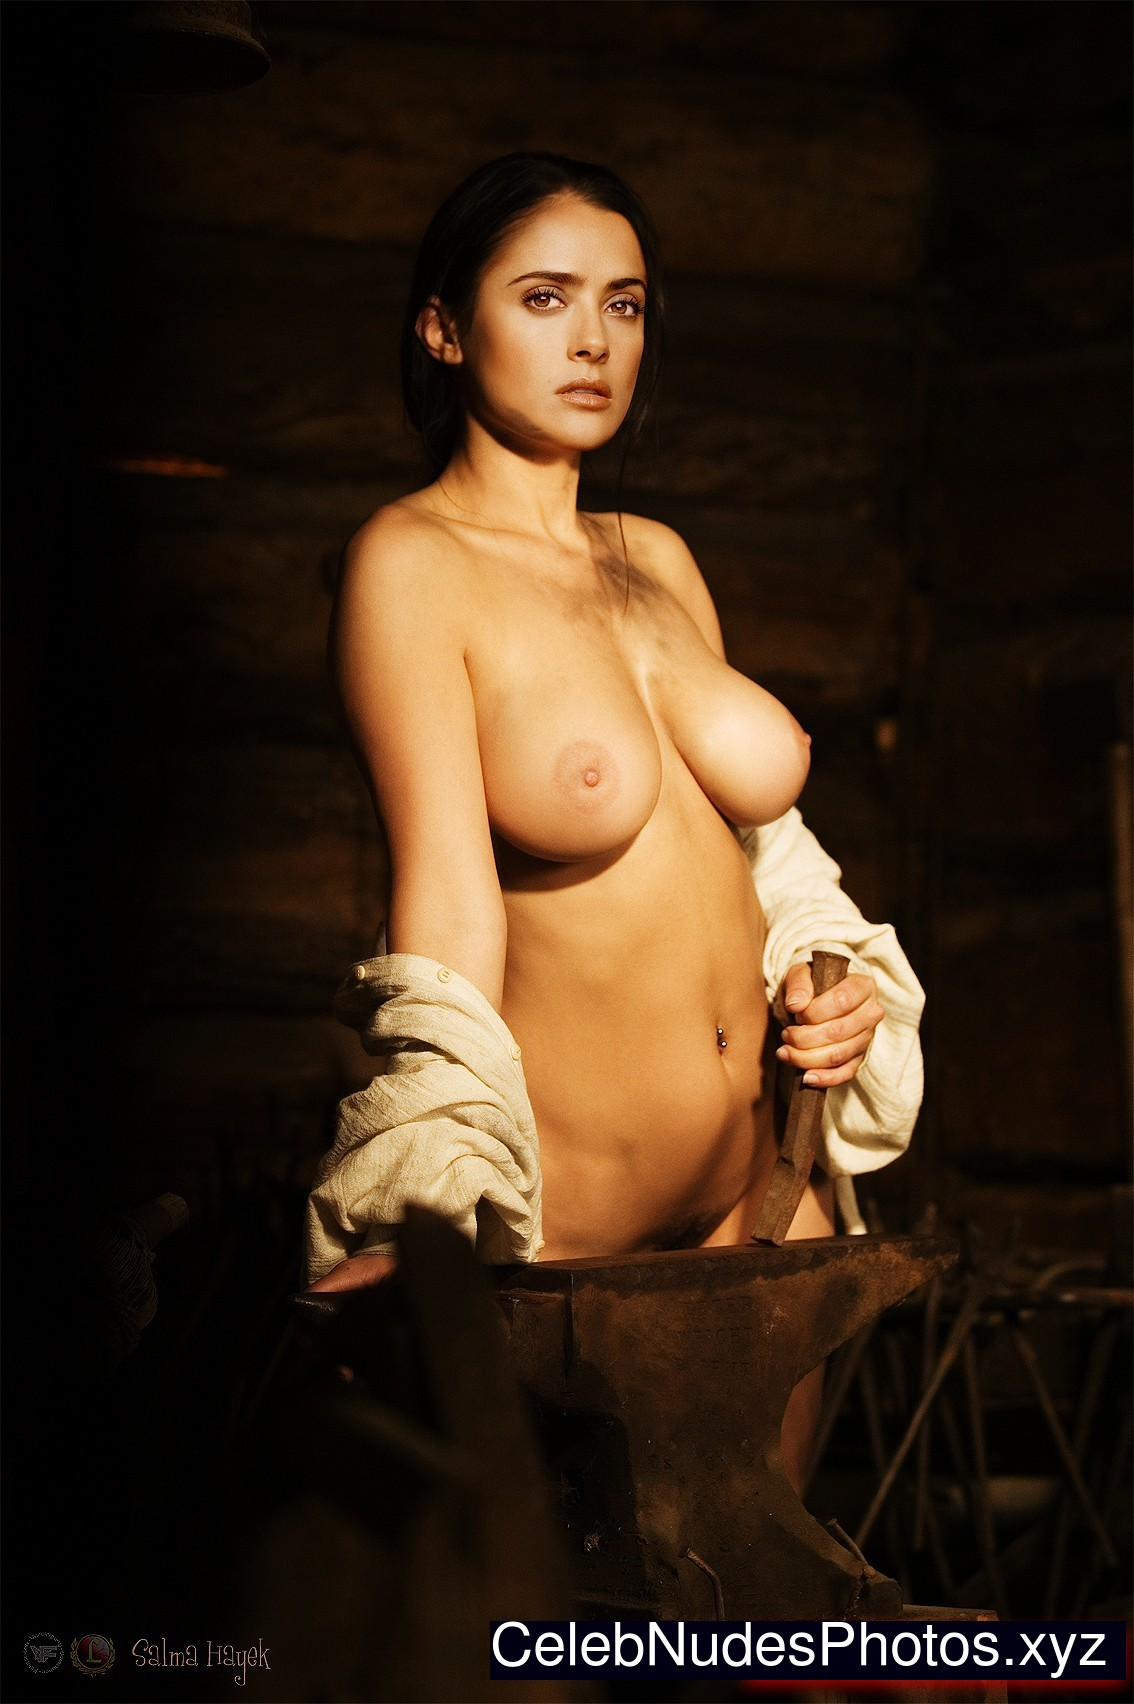 Clip frida hayek nude salma free porn galery, hot sex pics